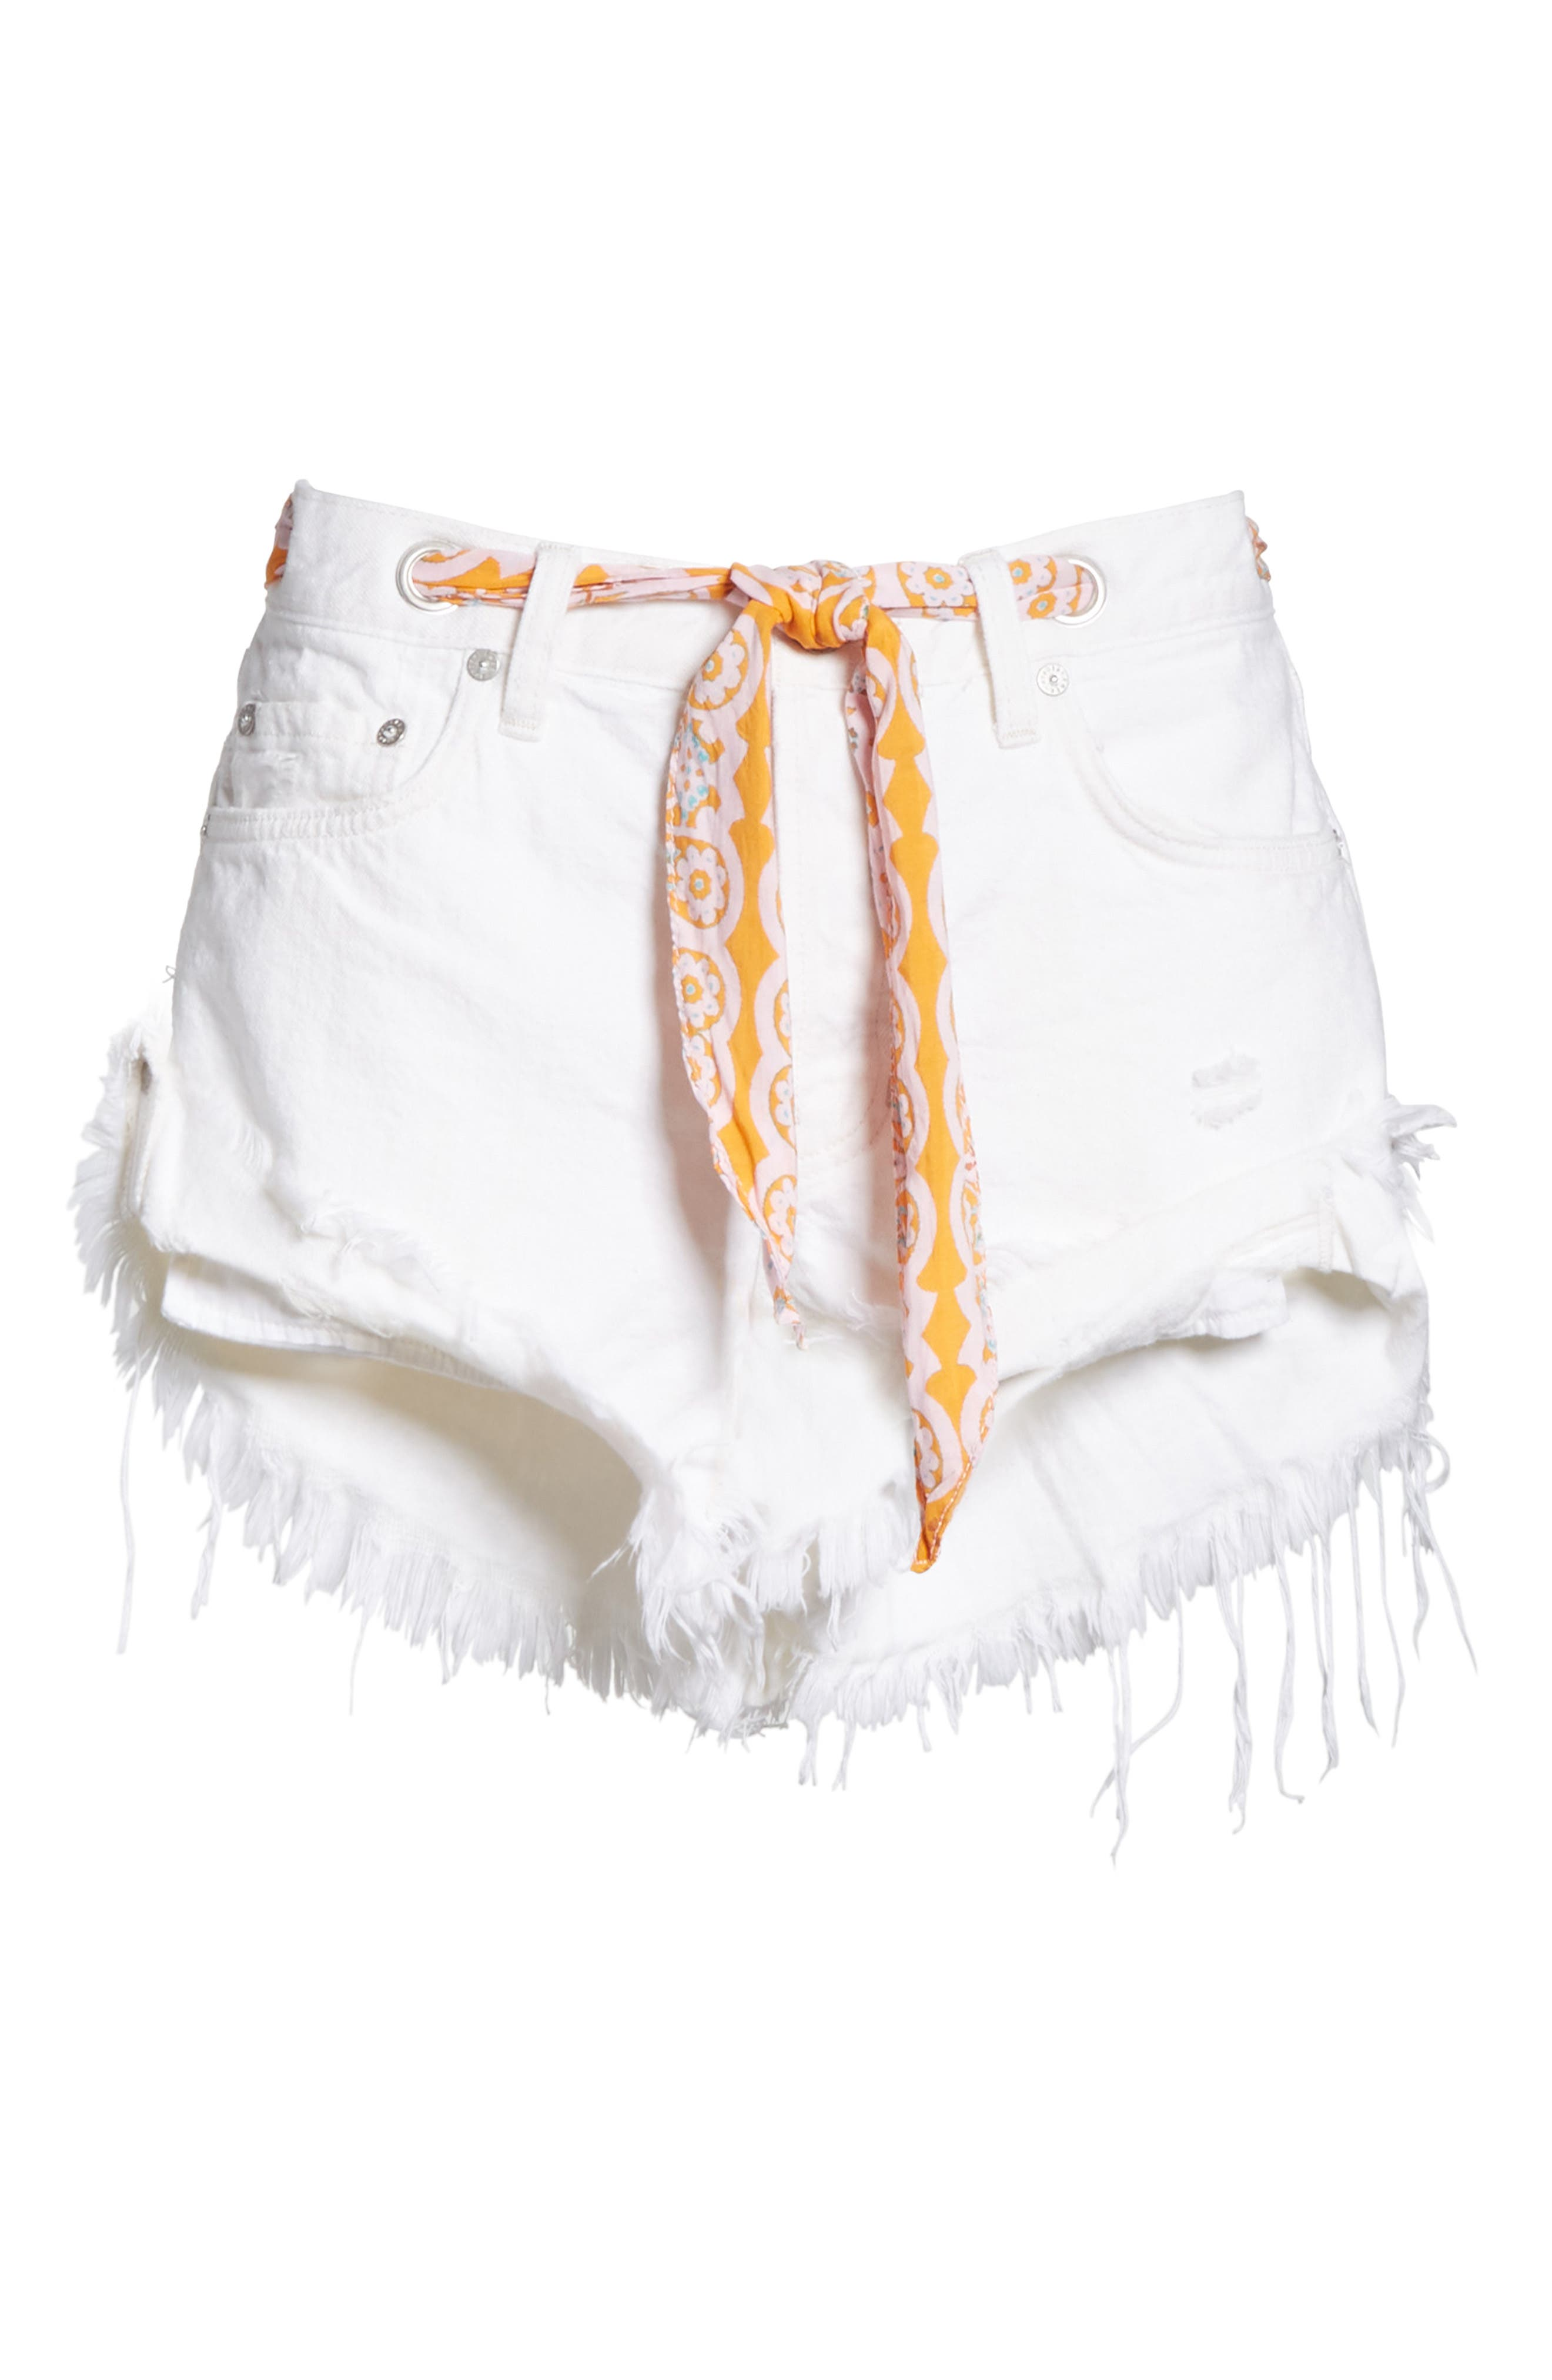 Cutoff Denim Shorts,                             Alternate thumbnail 7, color,